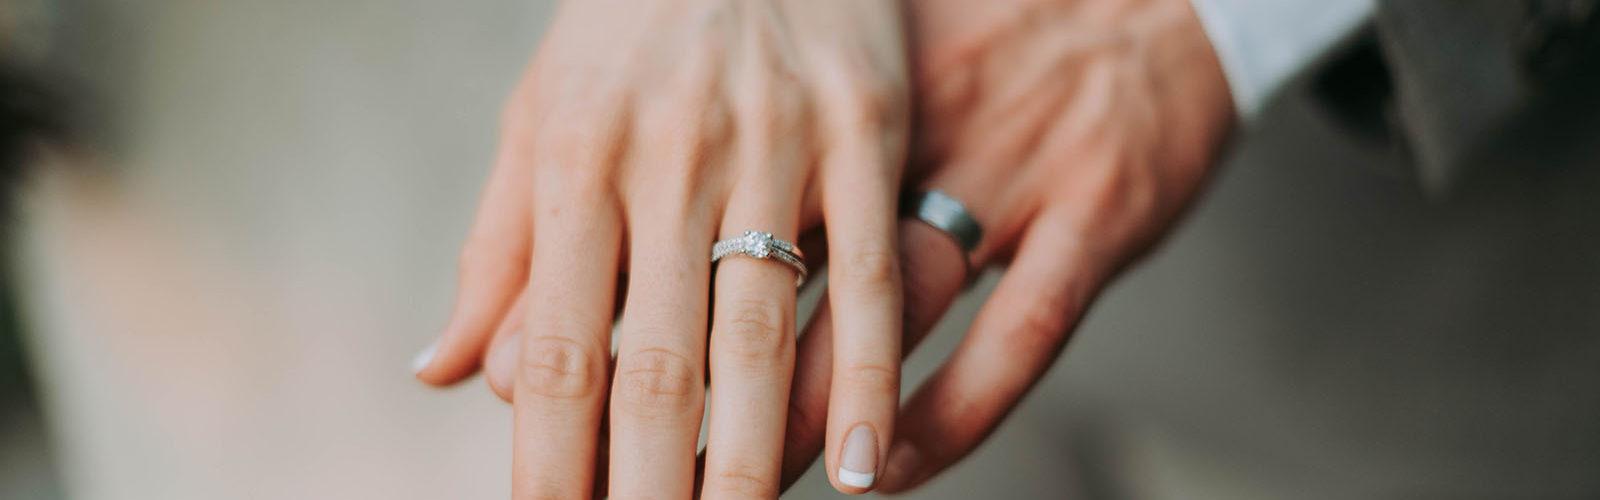 organiser-mariage-a-letranger-prix-cout-transfert-argent-usforex-cdp-une